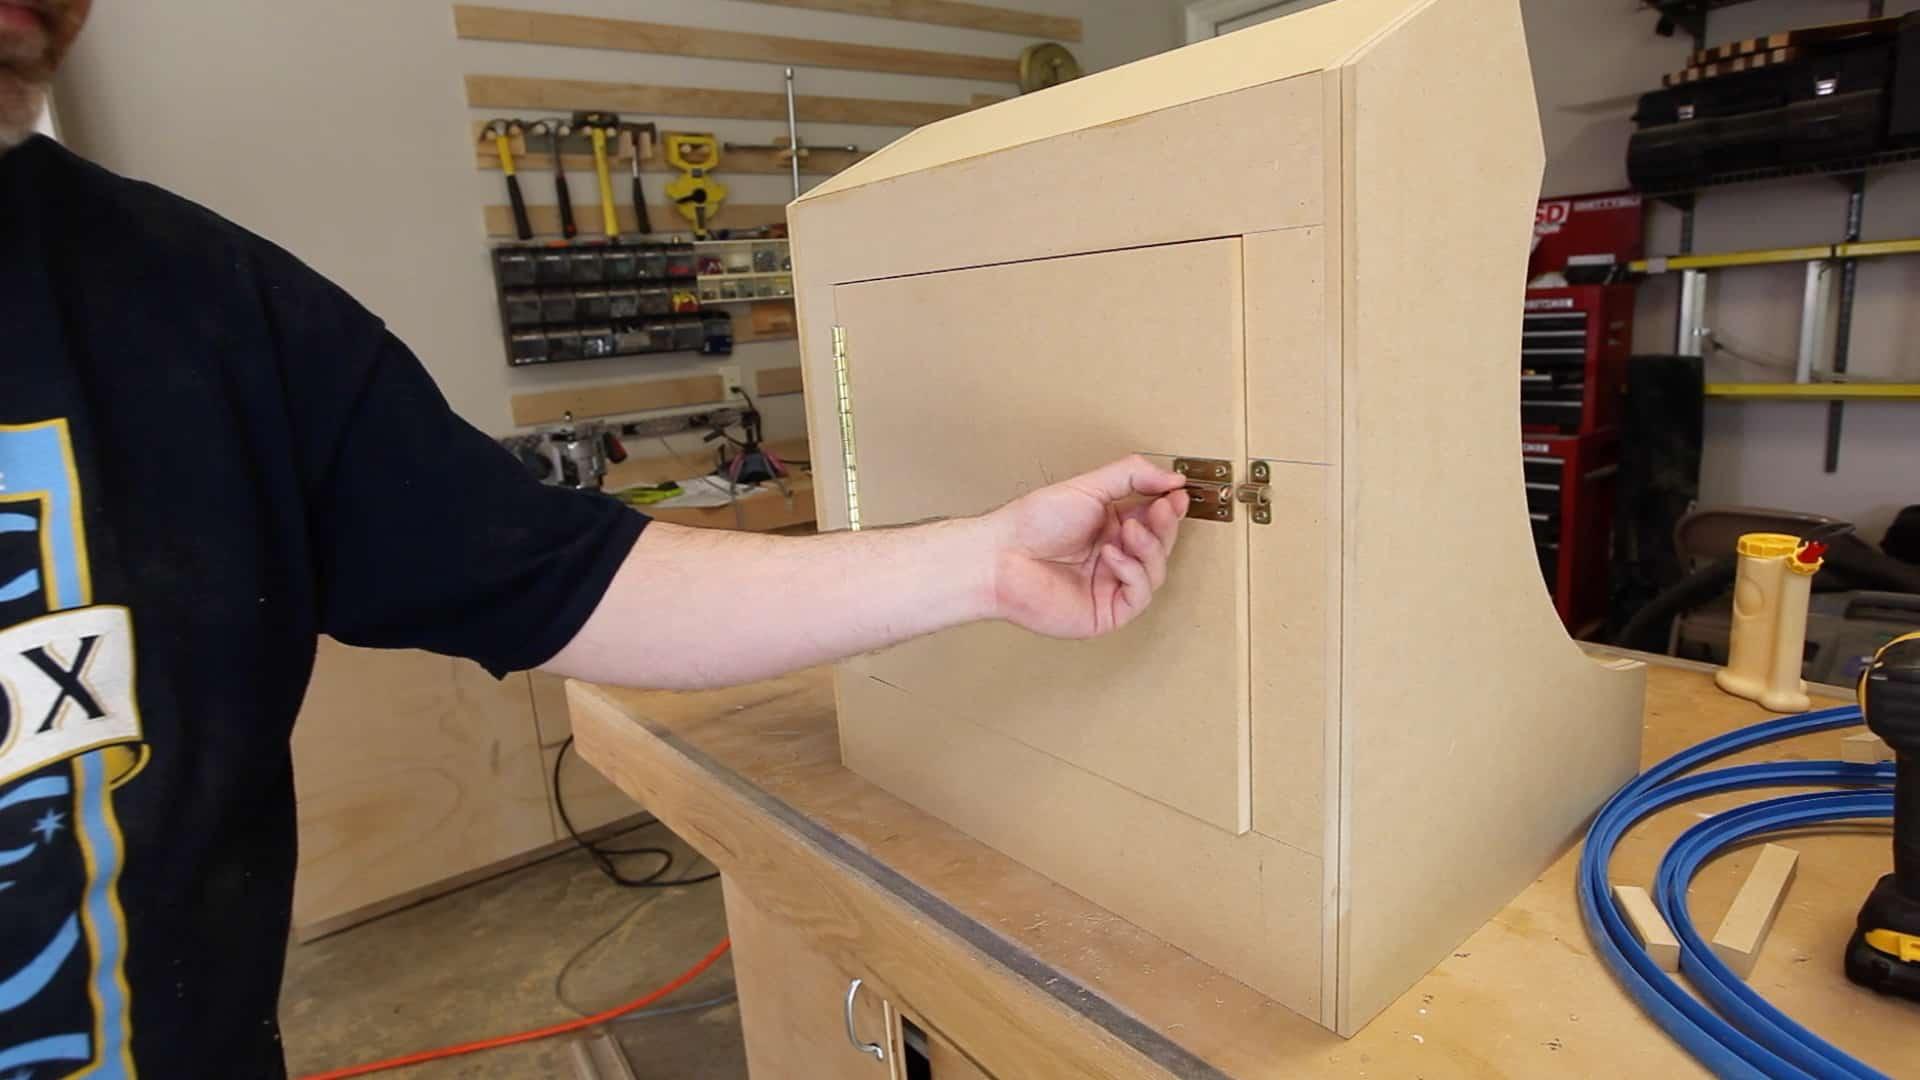 Etonnant RetroPie Bartop Arcade Cabinet 0031